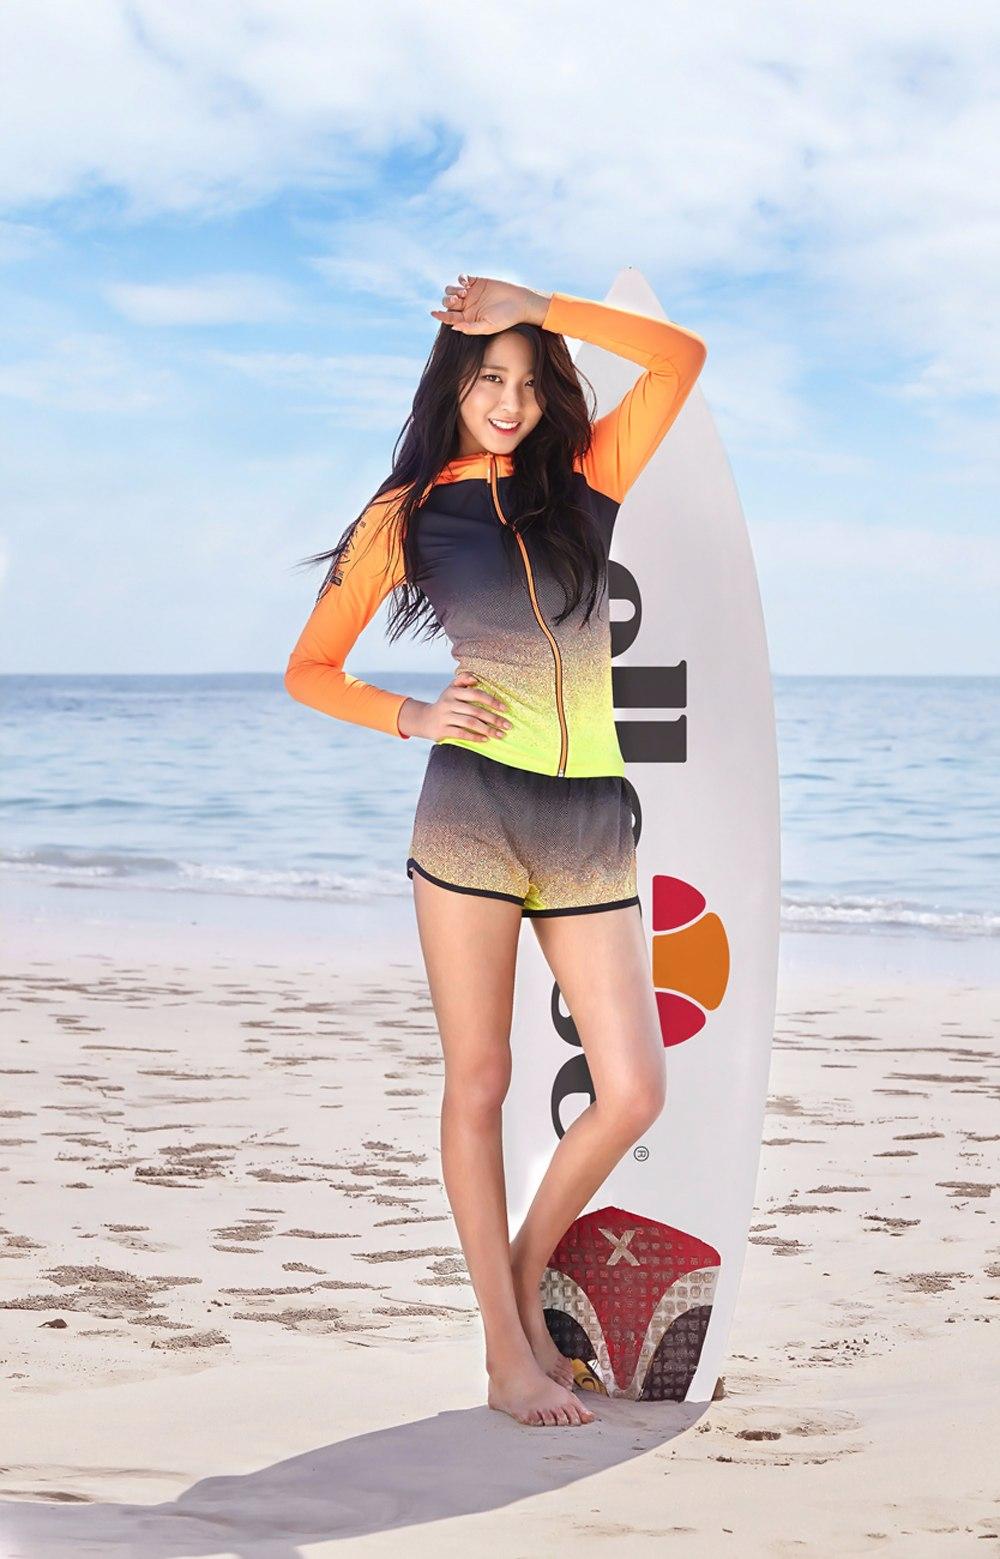 AOA雪炫繼電信公司人形立牌之後,替Ellesse拍攝的海報再次引起不小的話題!!!